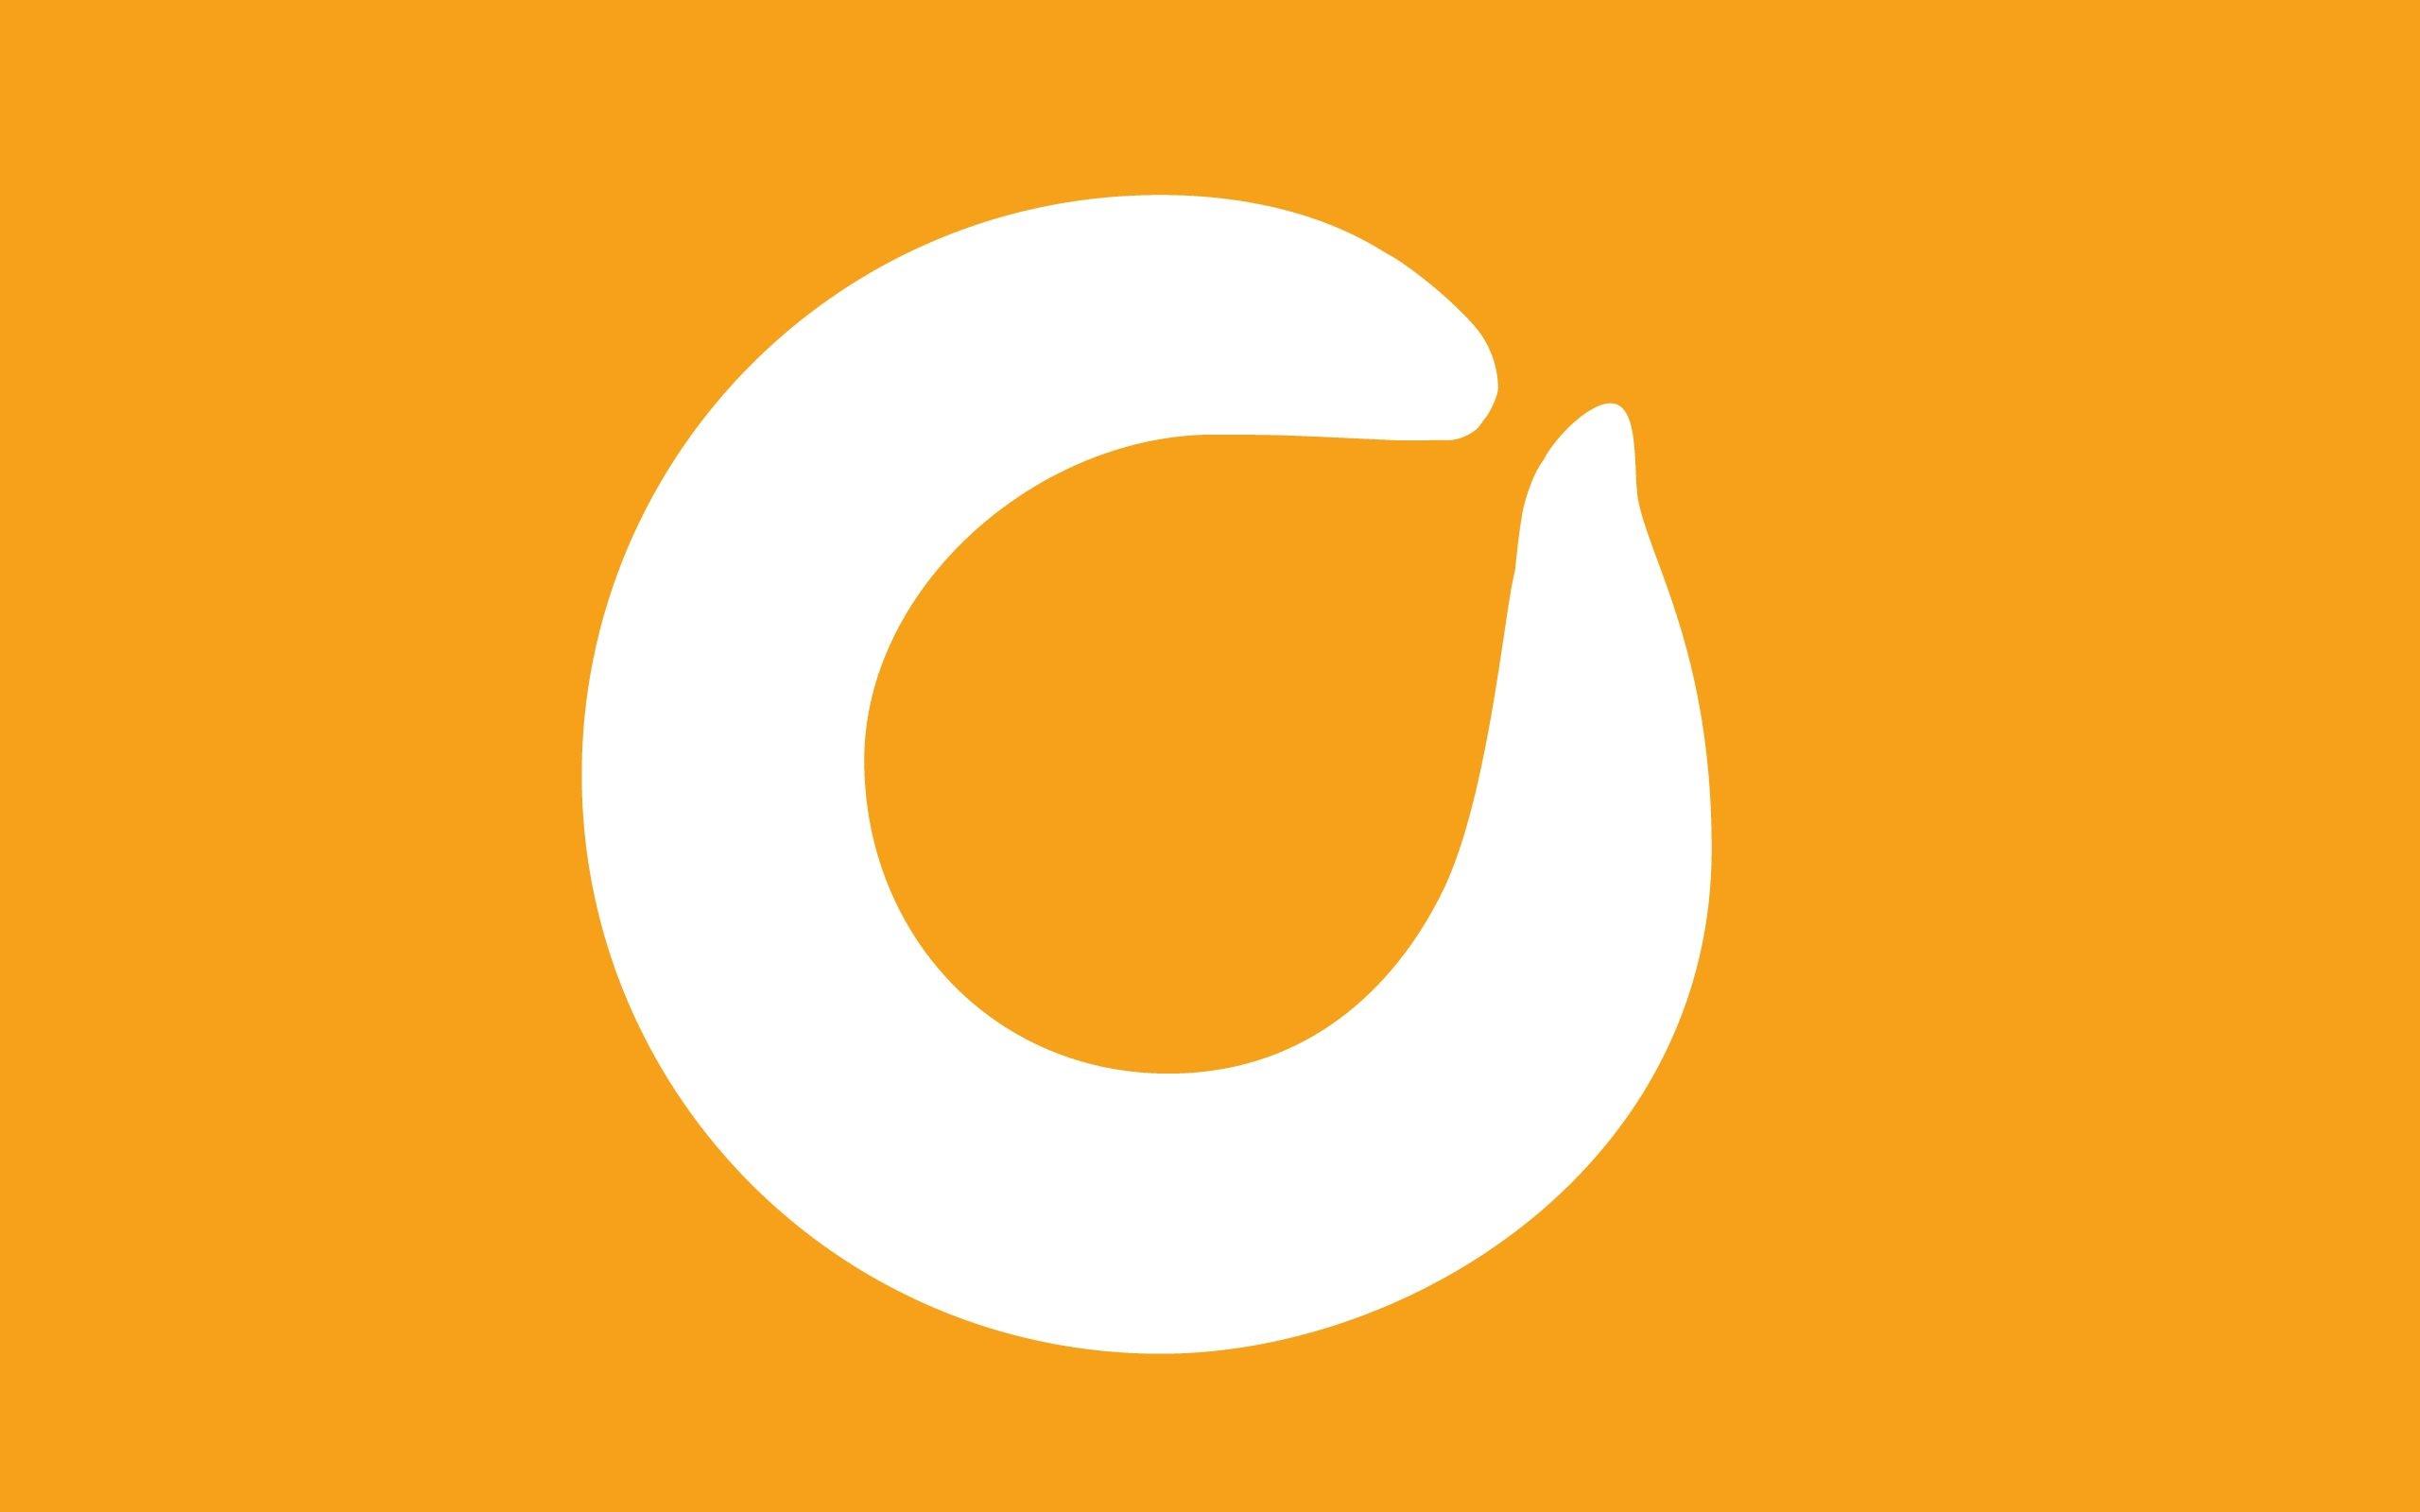 Download wallpaper 2560x1600 orange leaf frozen yogurt, logo.